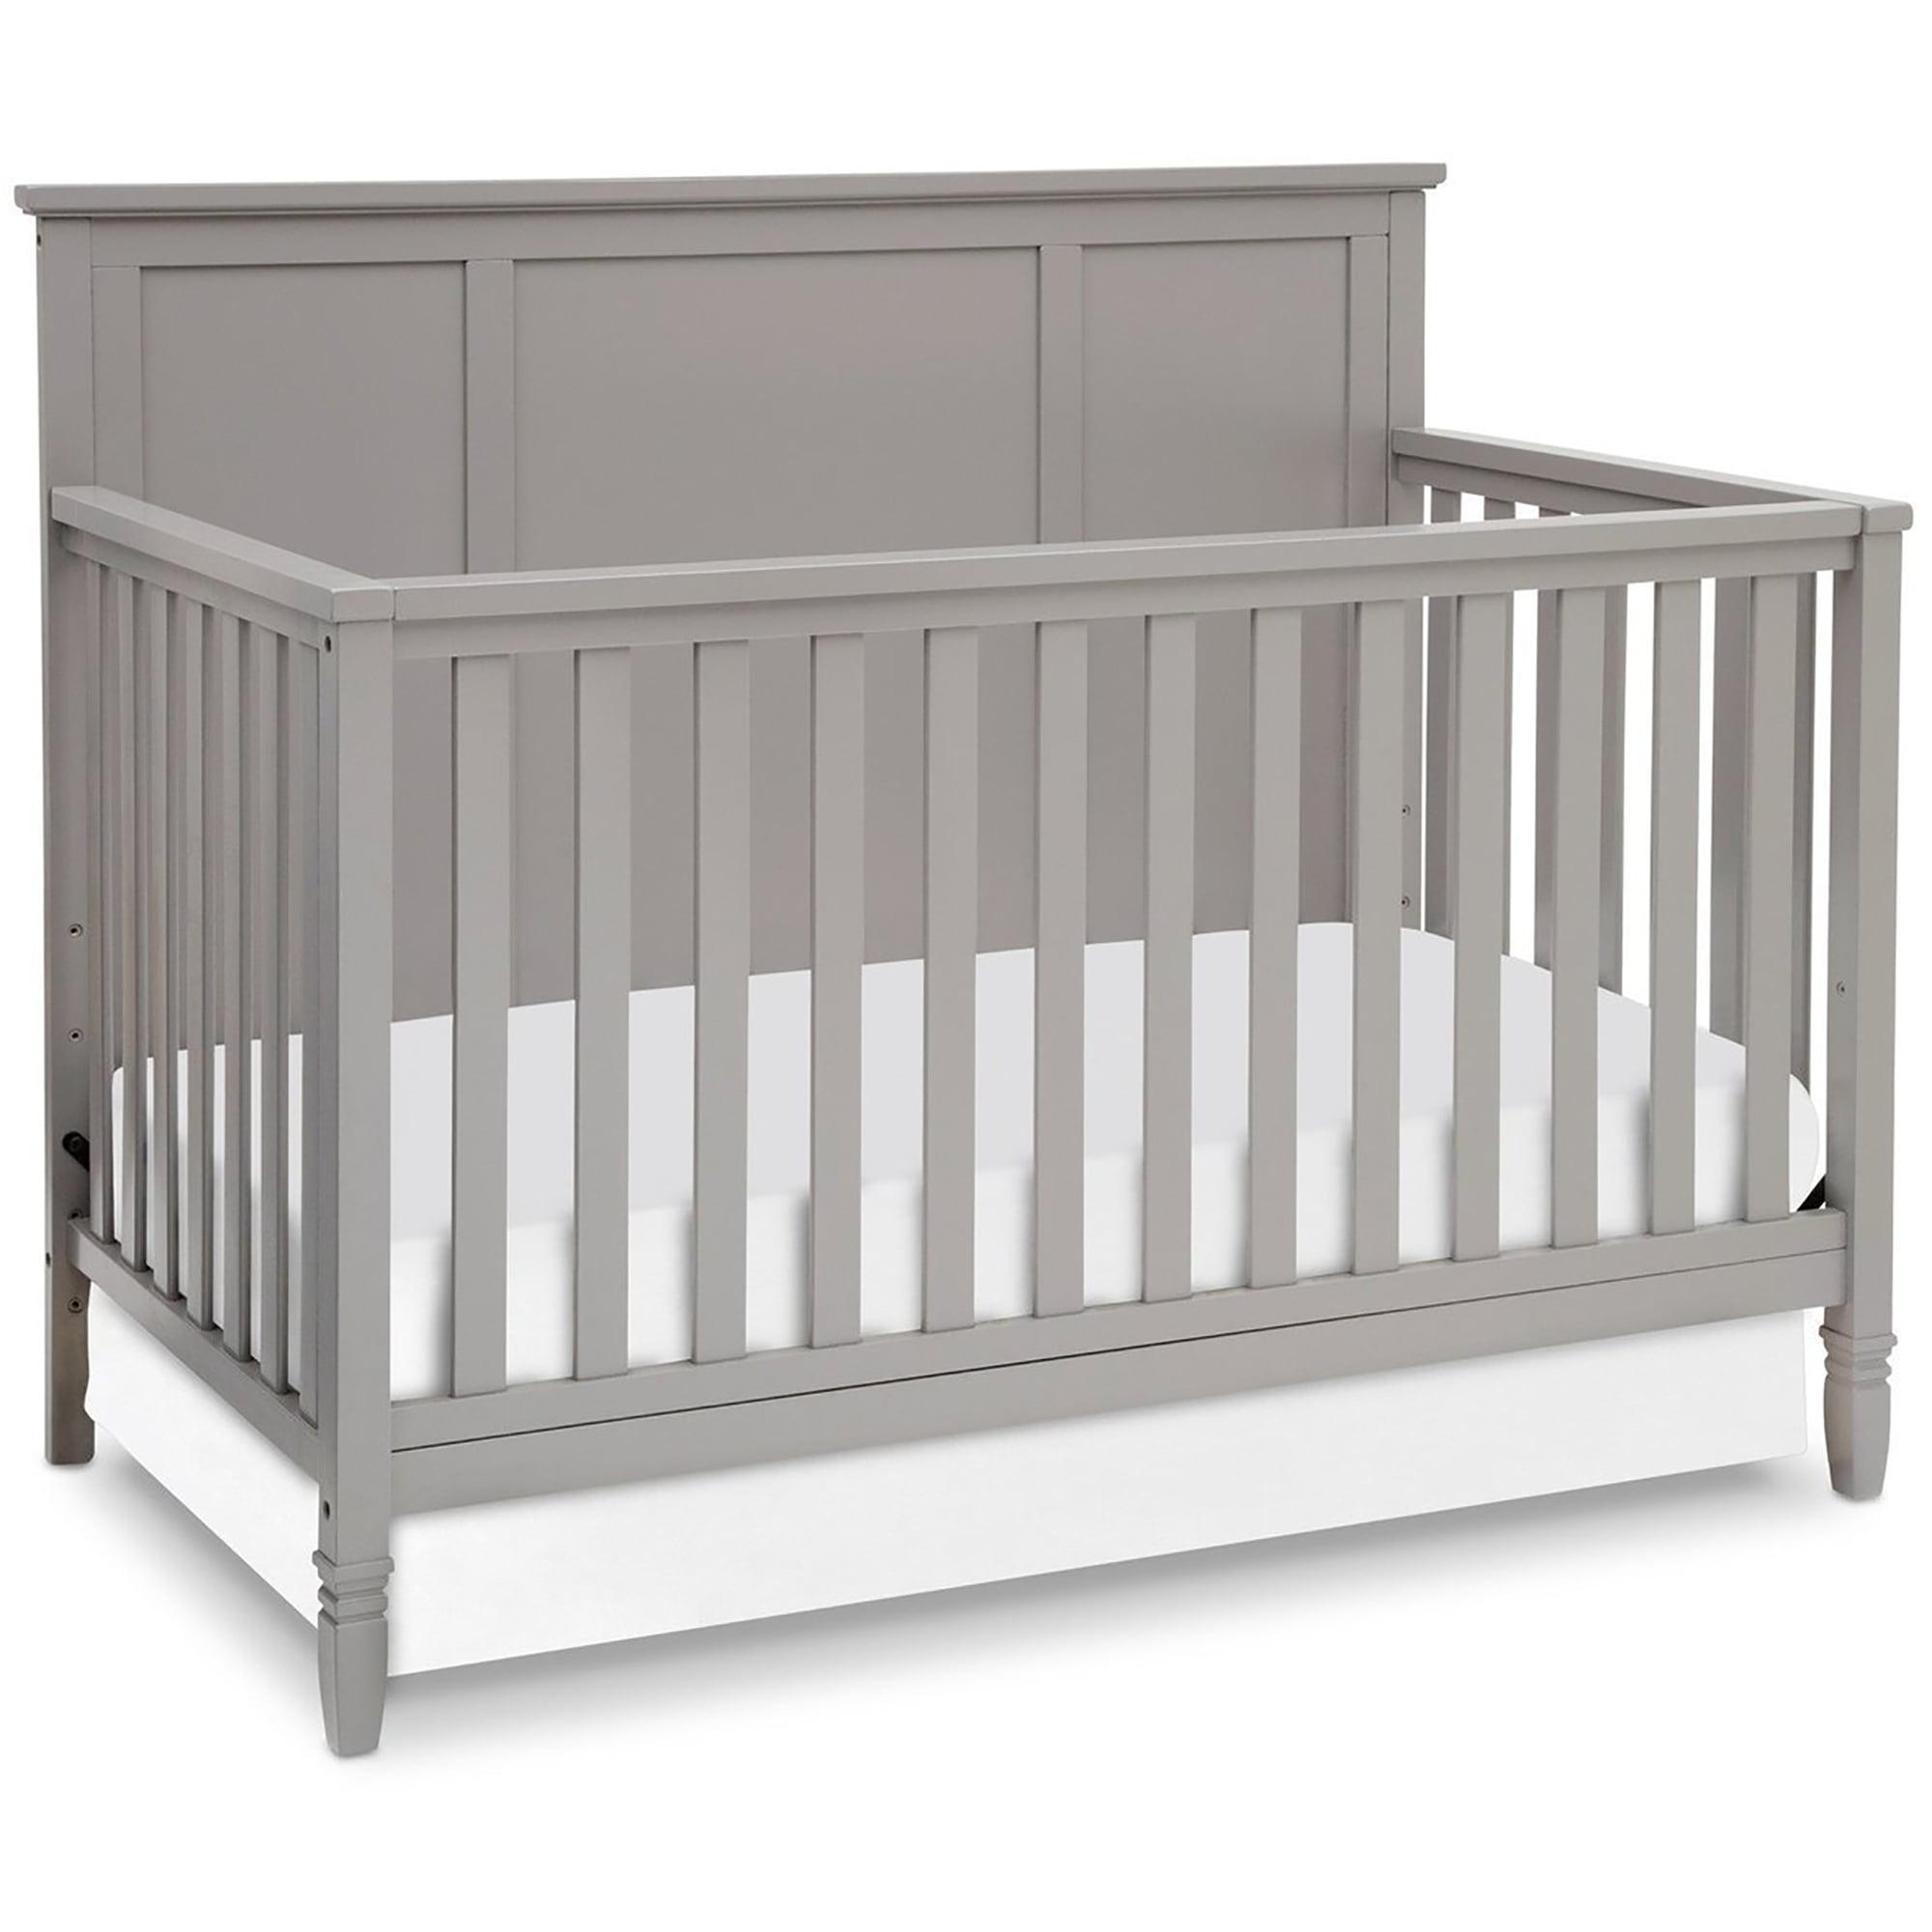 Delta Children Epic 4 In 1 Convertible Crib Gray Walmart Com Walmart Com